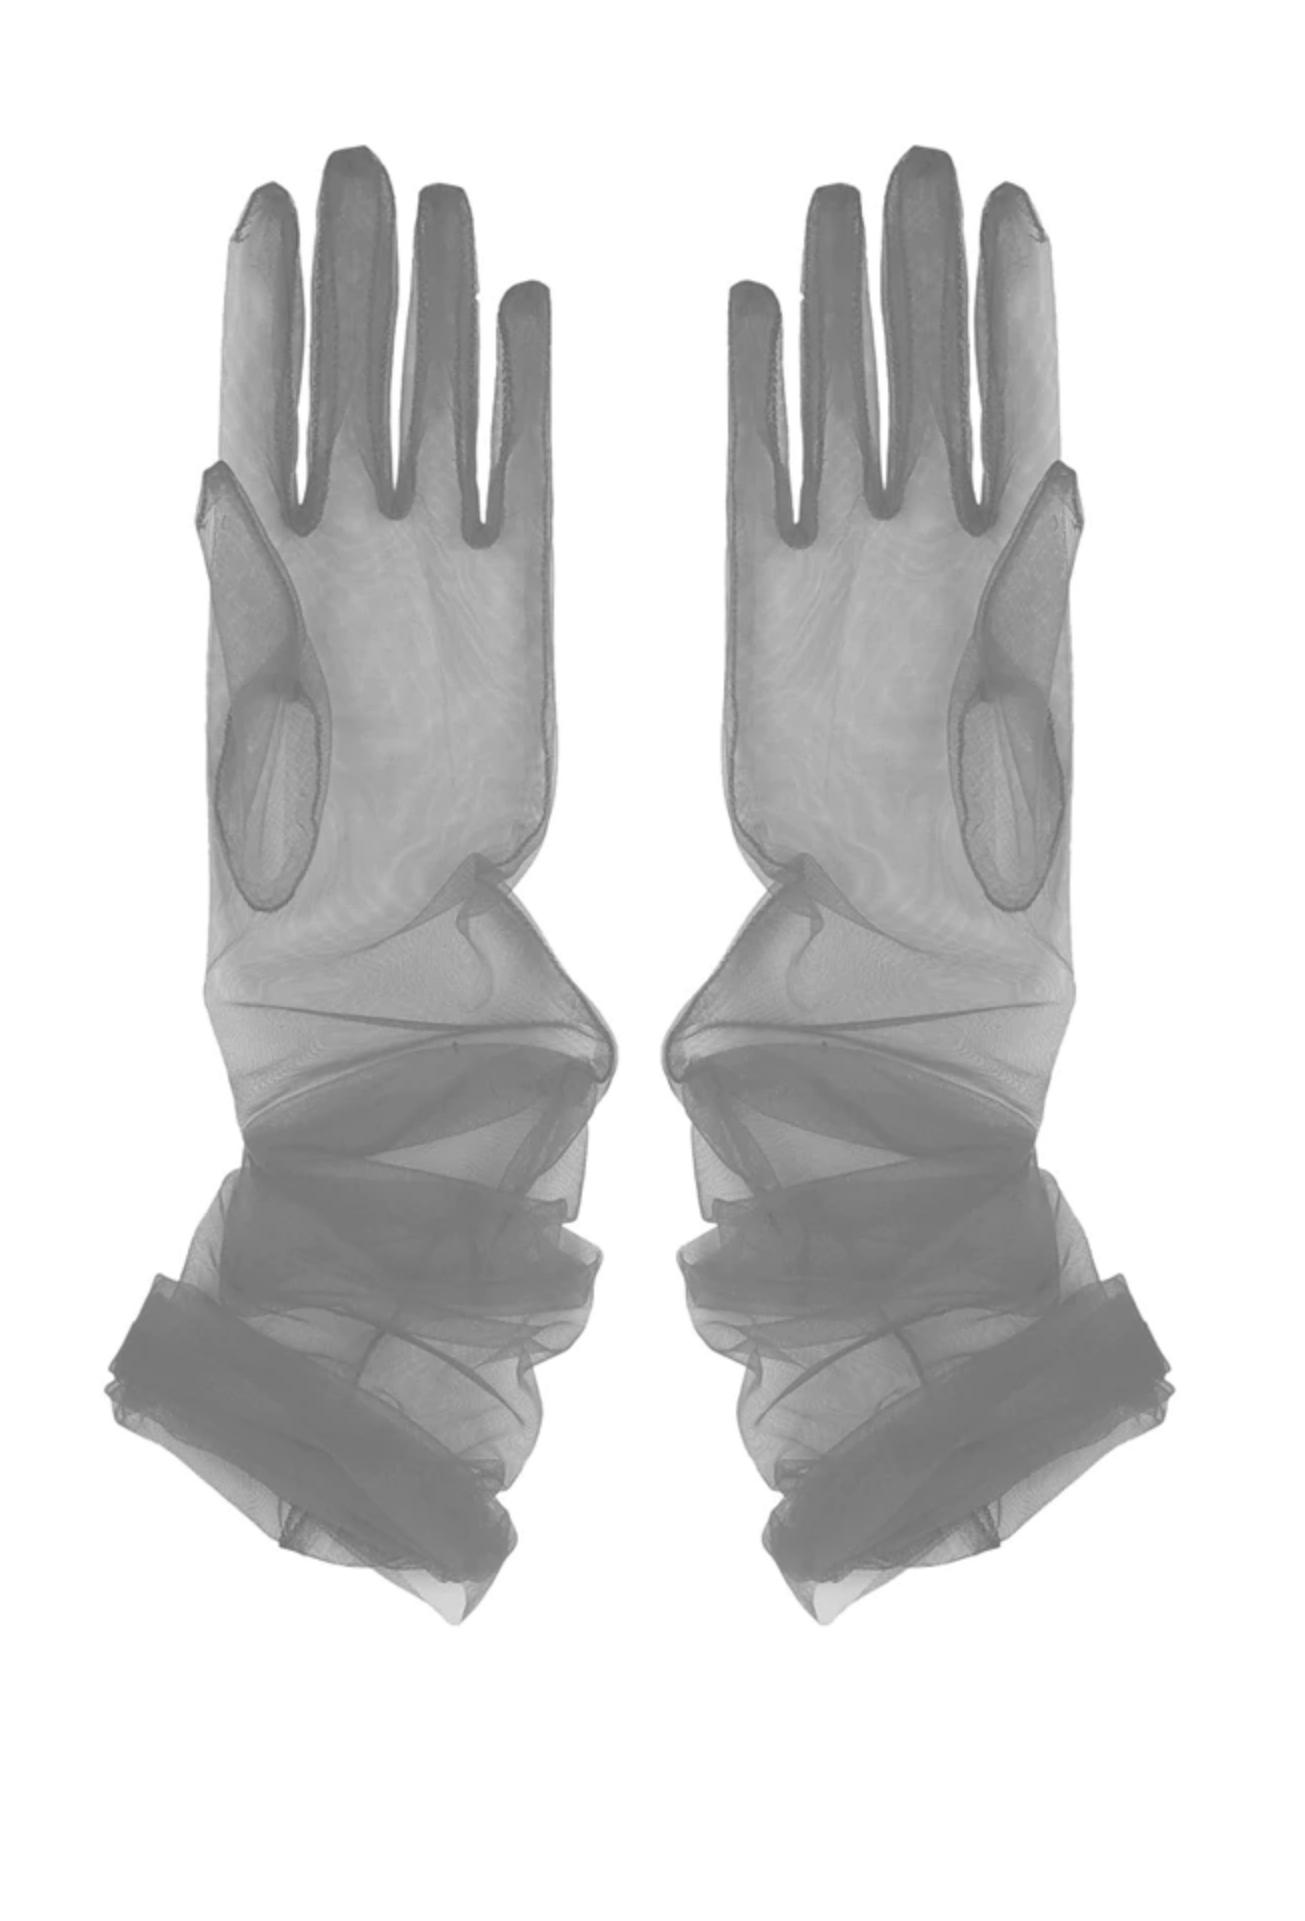 Evening-Gloves-1207